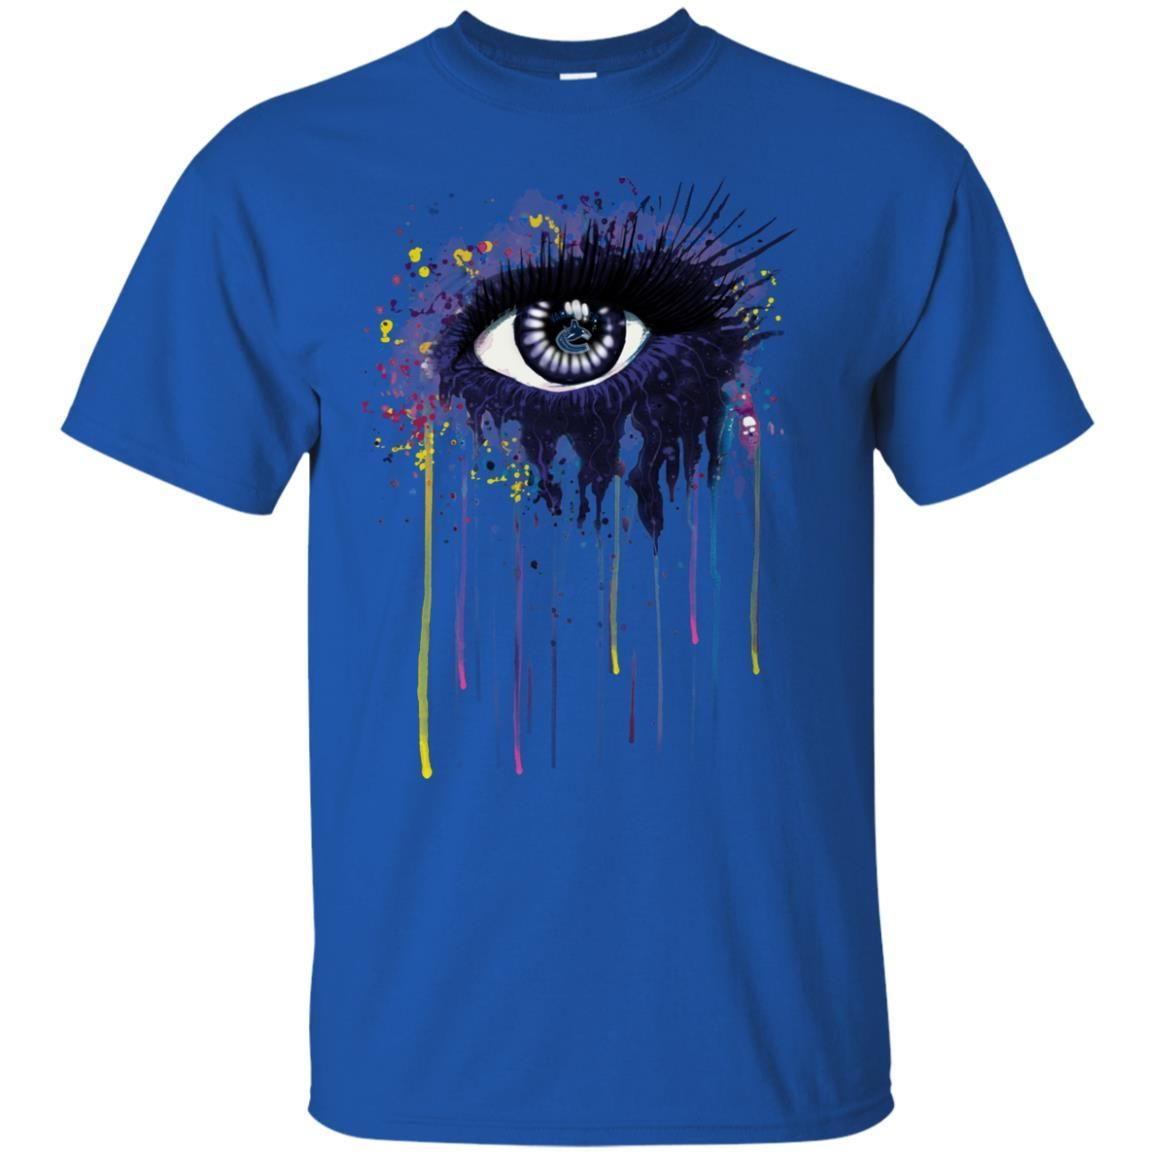 Vancouver Canucks Die Hard Fans Art Canucks S S Shirts